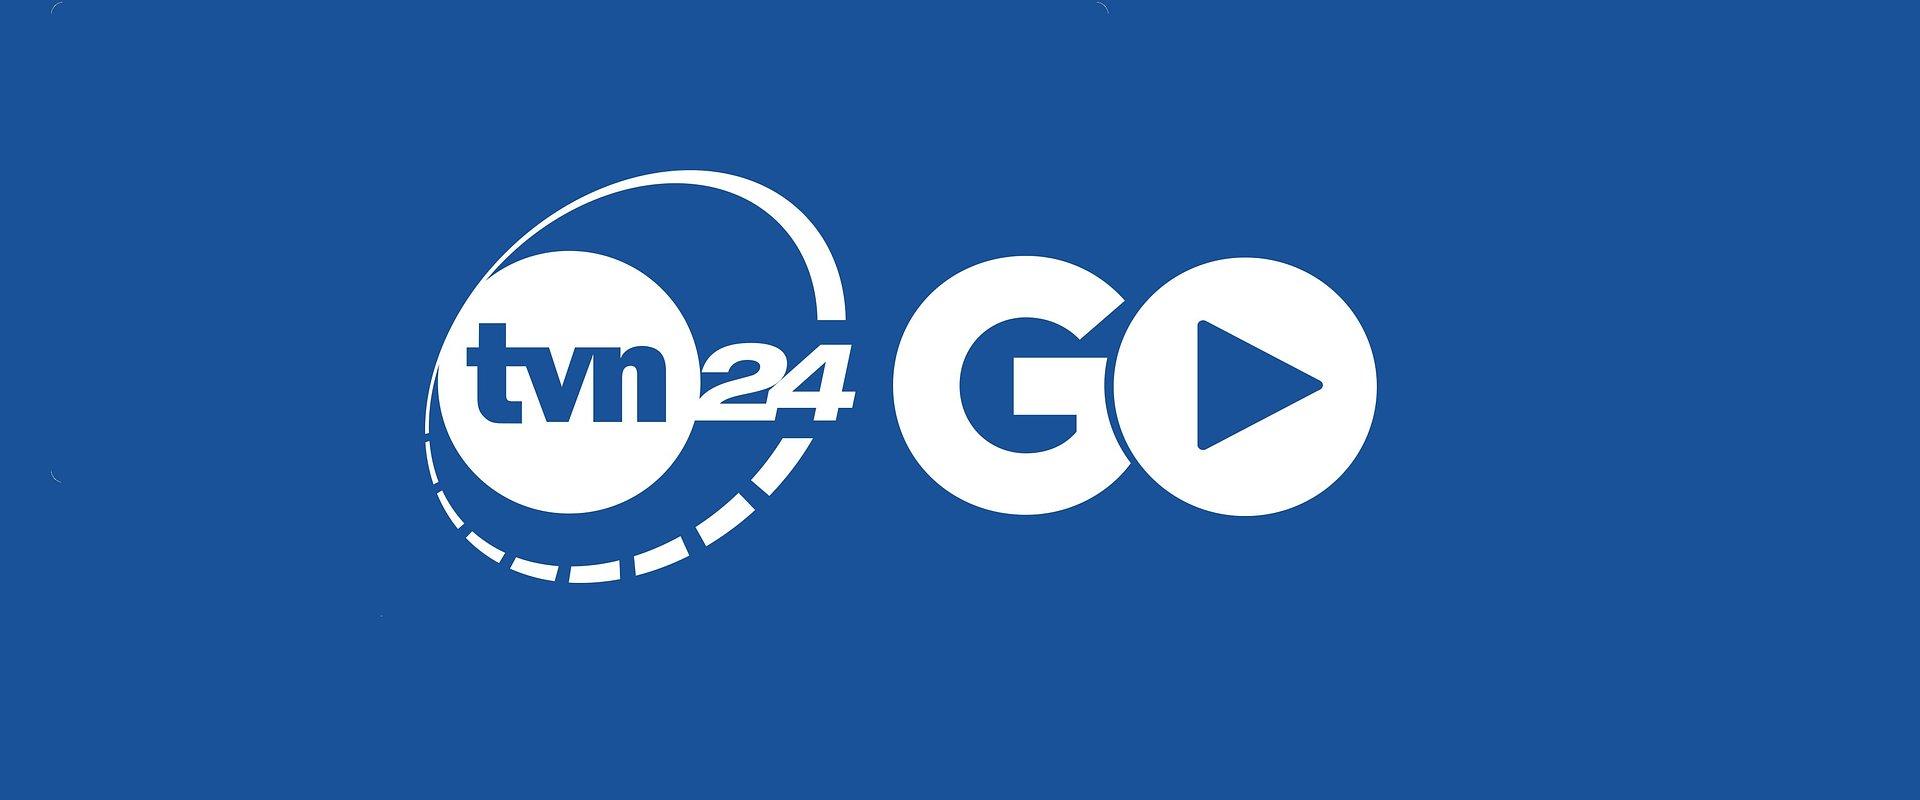 Subskrypcja TVN24 GO na rachunku T-Mobile